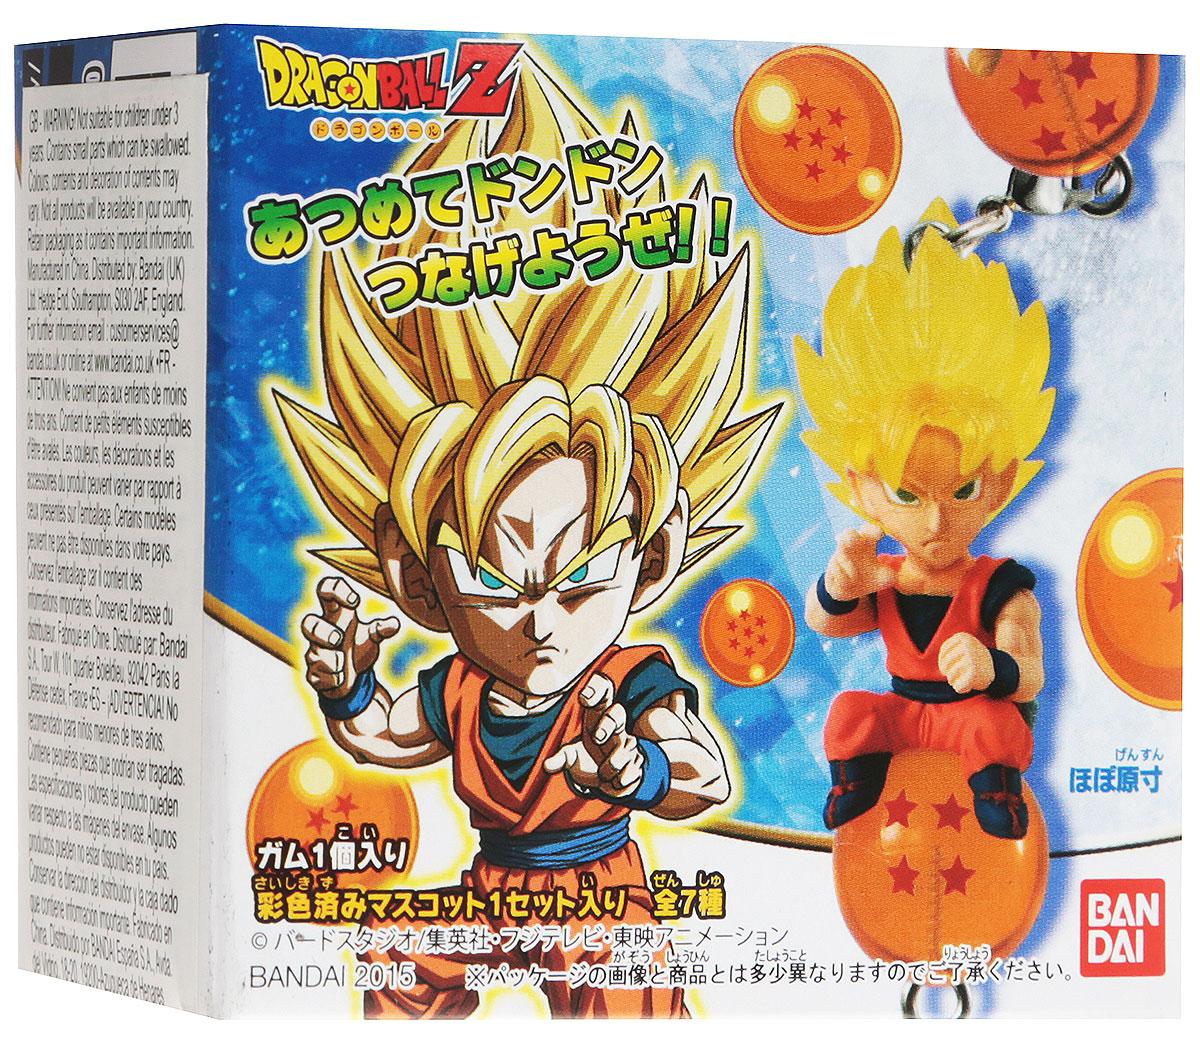 Bandai Фигурка Dragon Ball Strap, 4,5 см (в ассортименте)